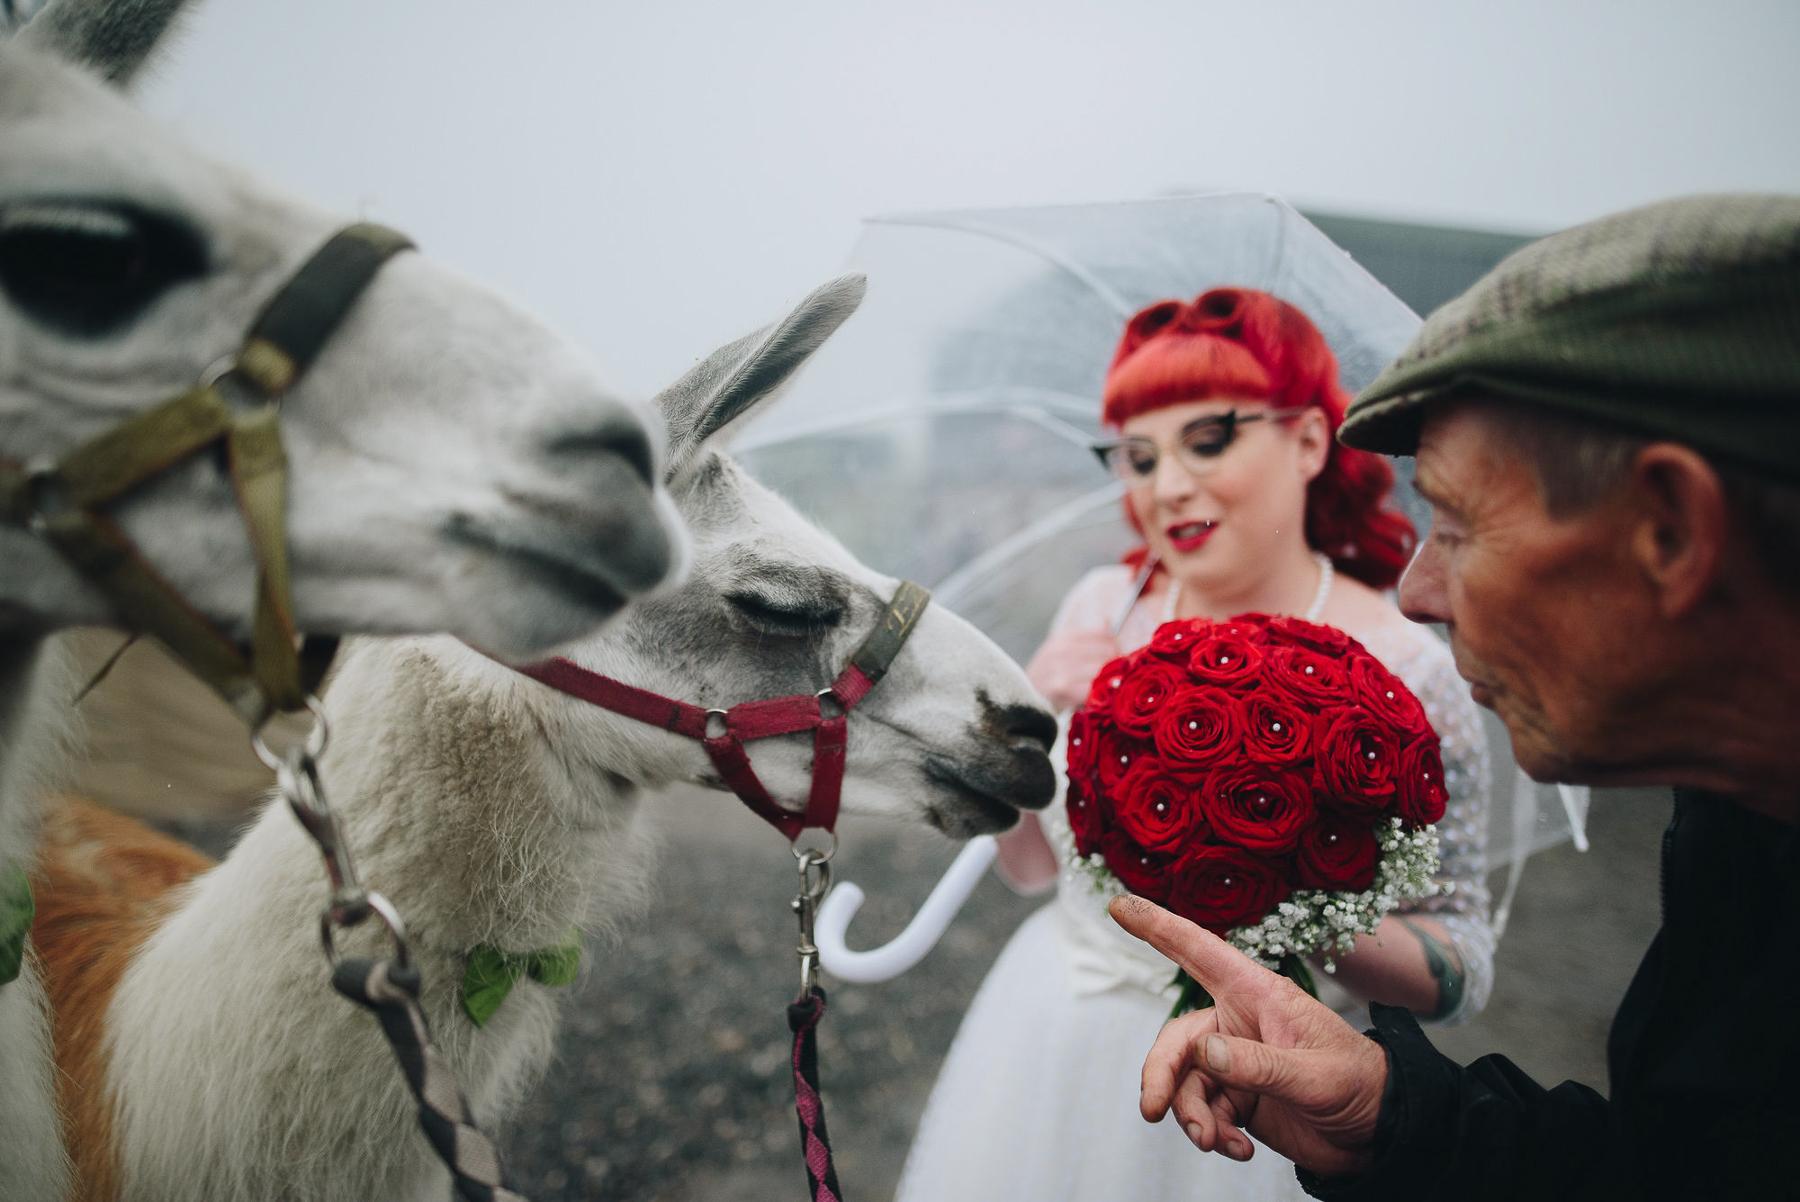 Wellbeing_Farm_Wedding_Photography_The_Pin-Up_Bride_Lara_Shaun-77.jpg